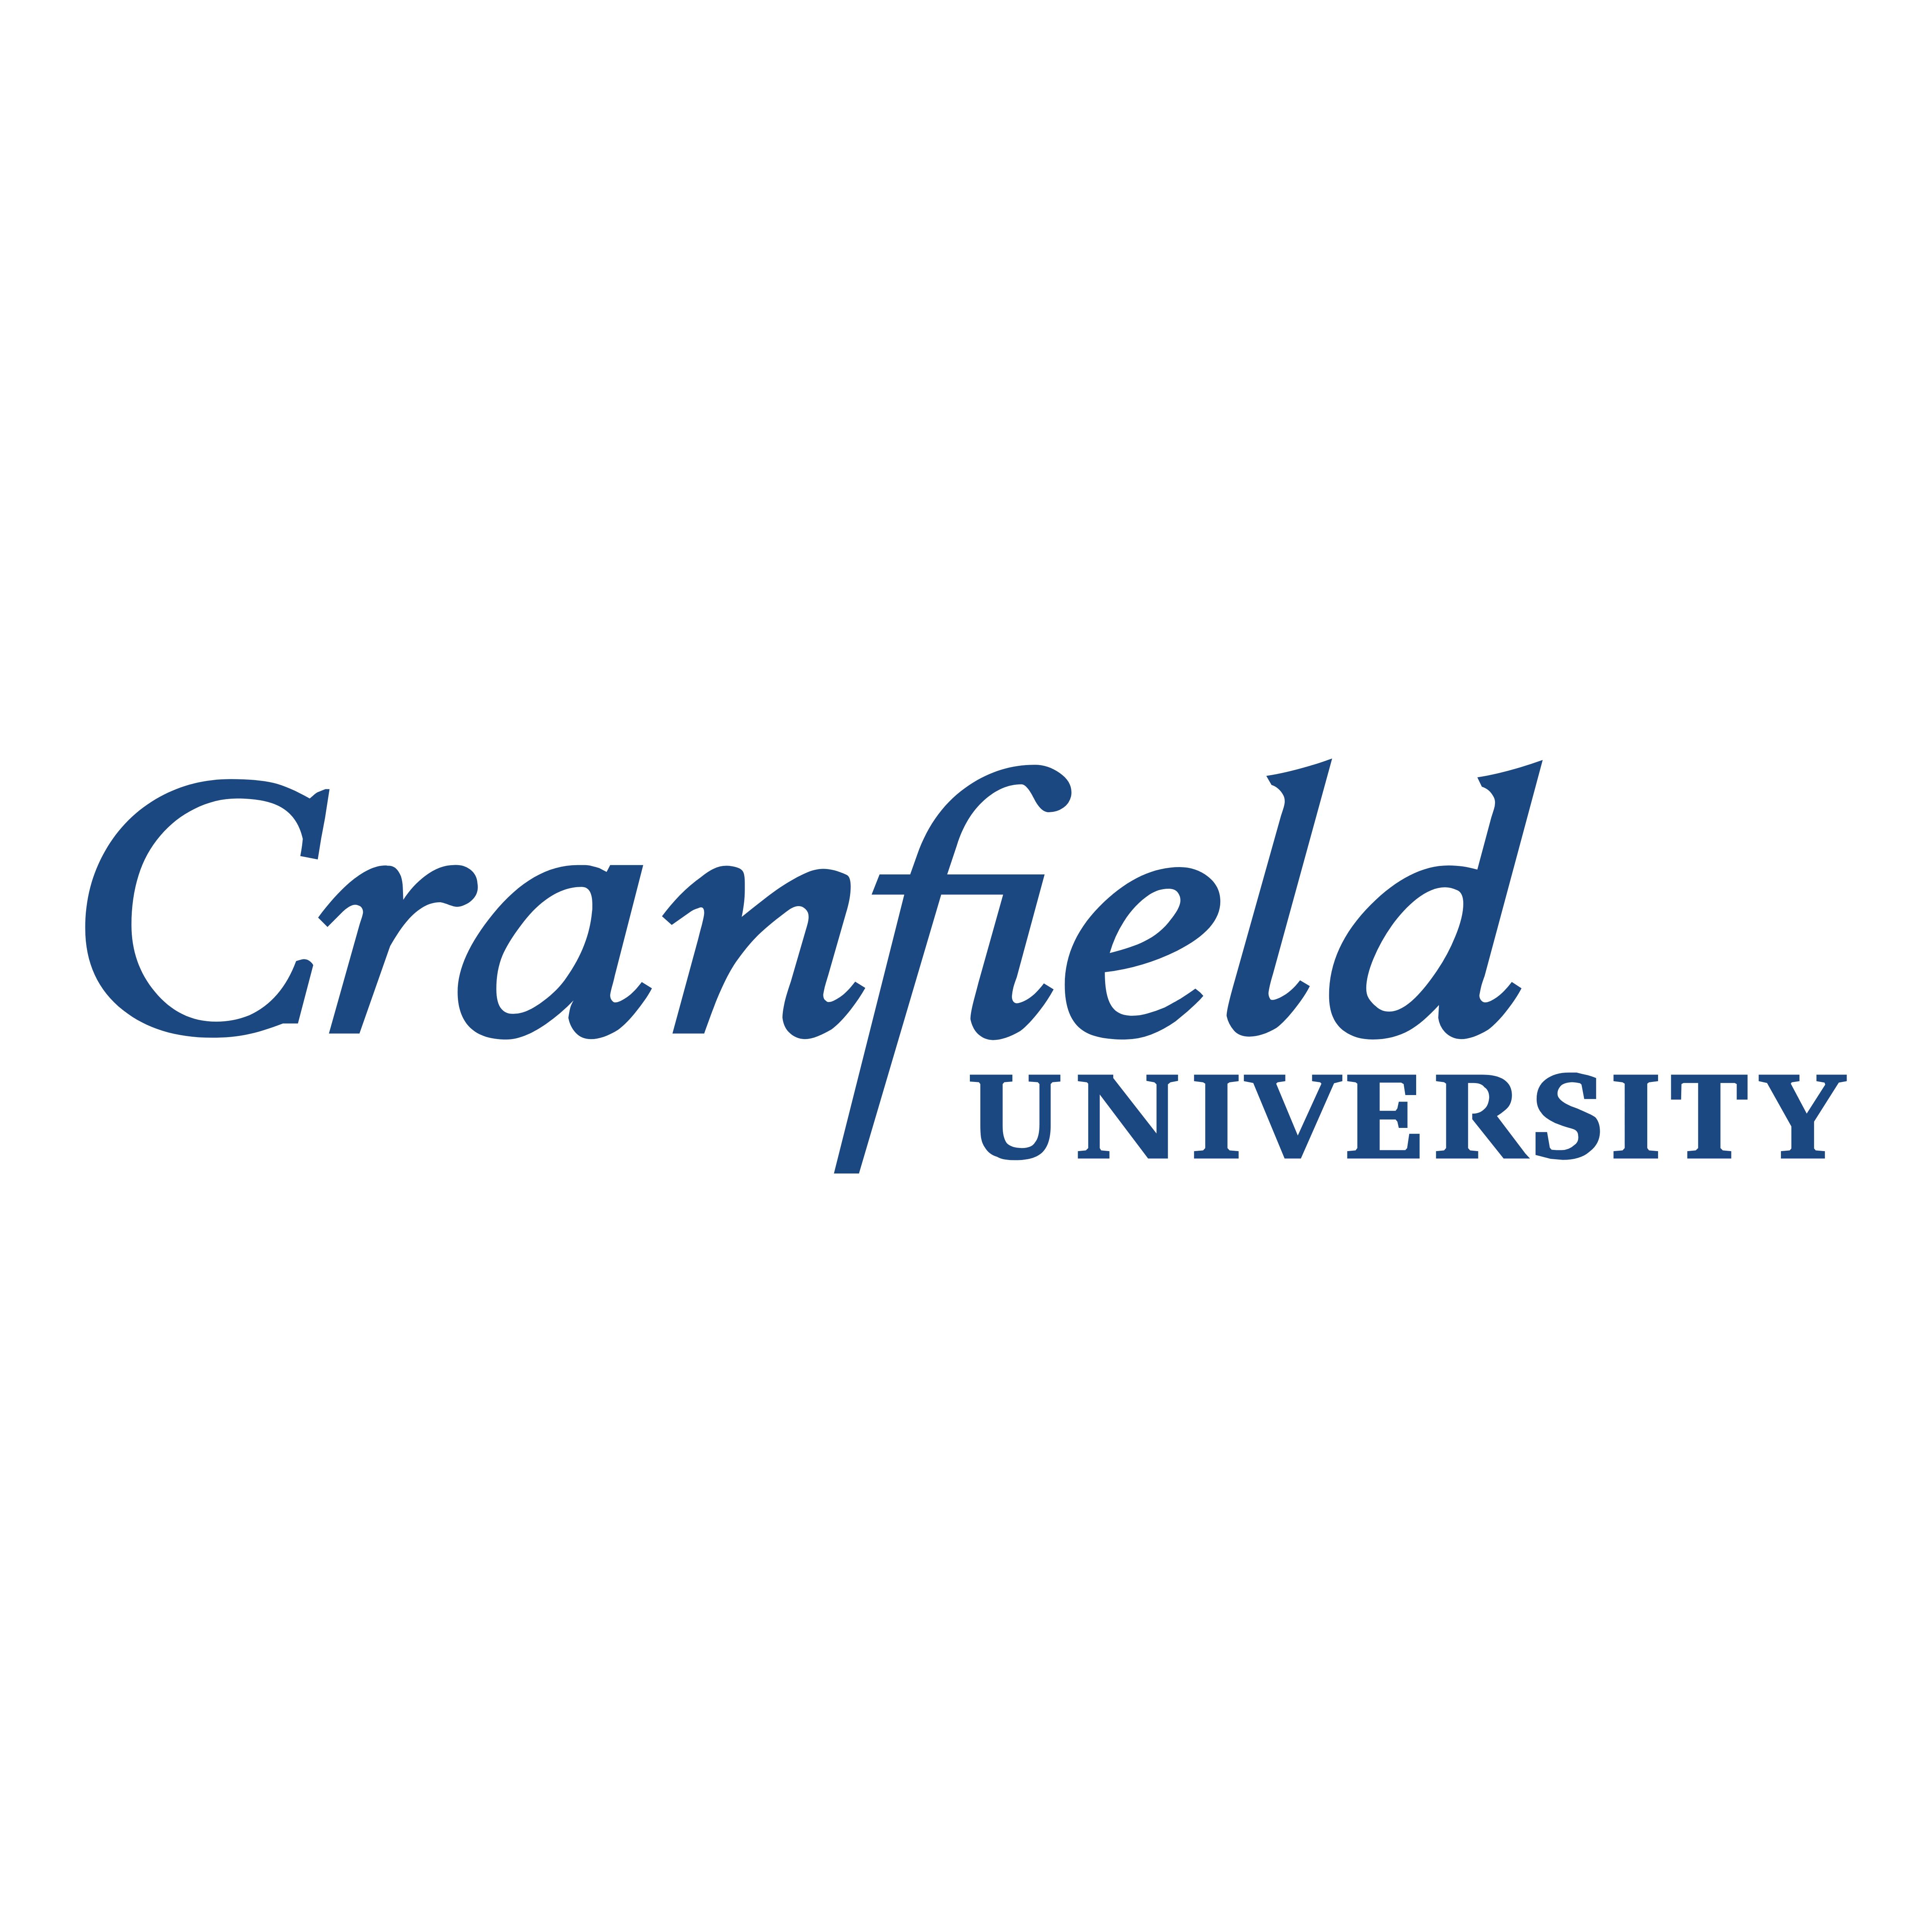 Cranfield University – Logos Download